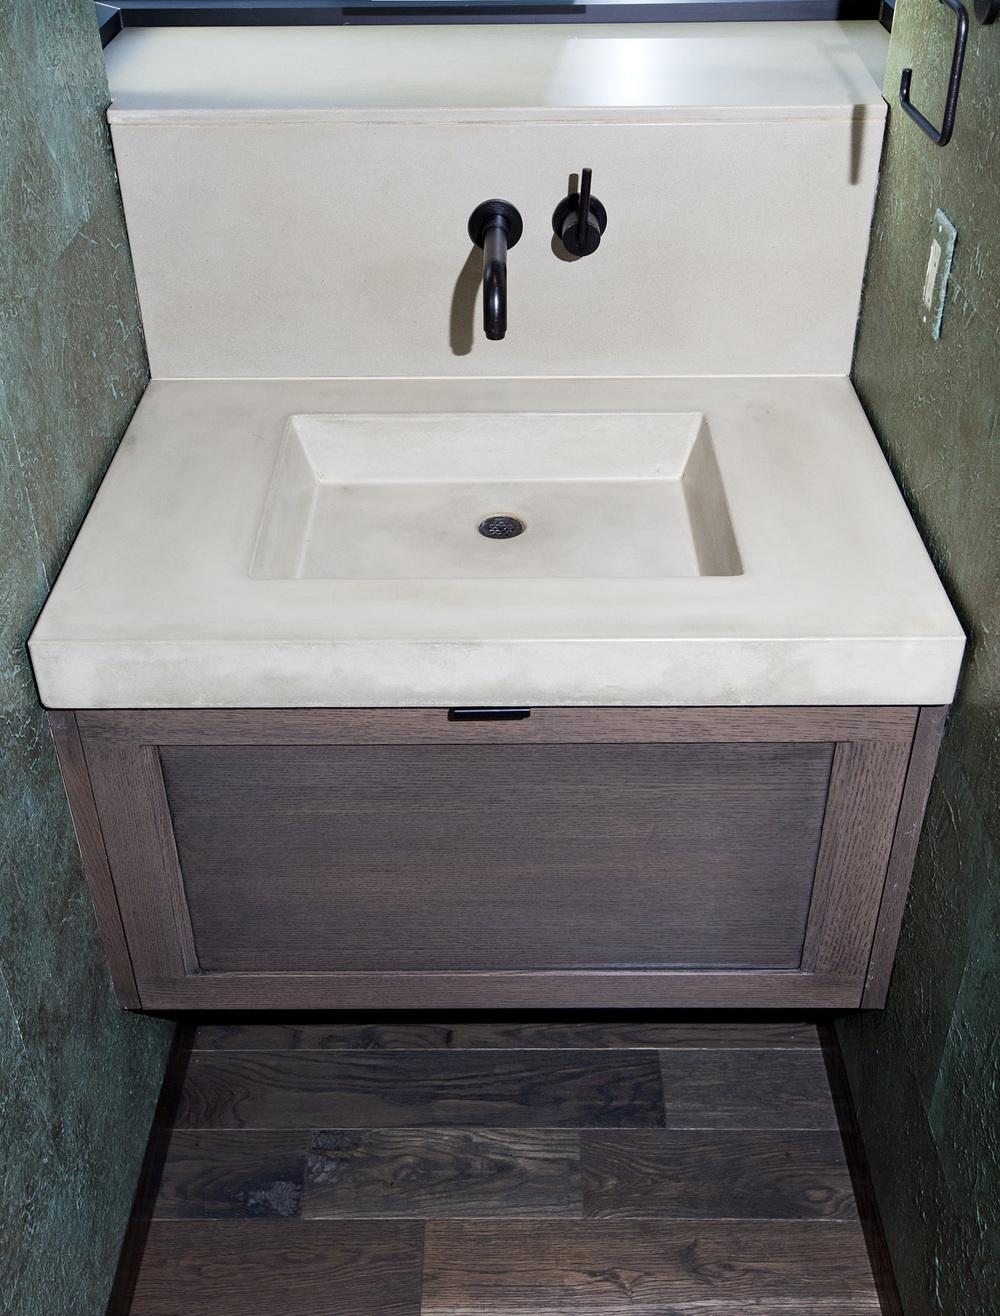 GH_bathroom_sink (2).jpg